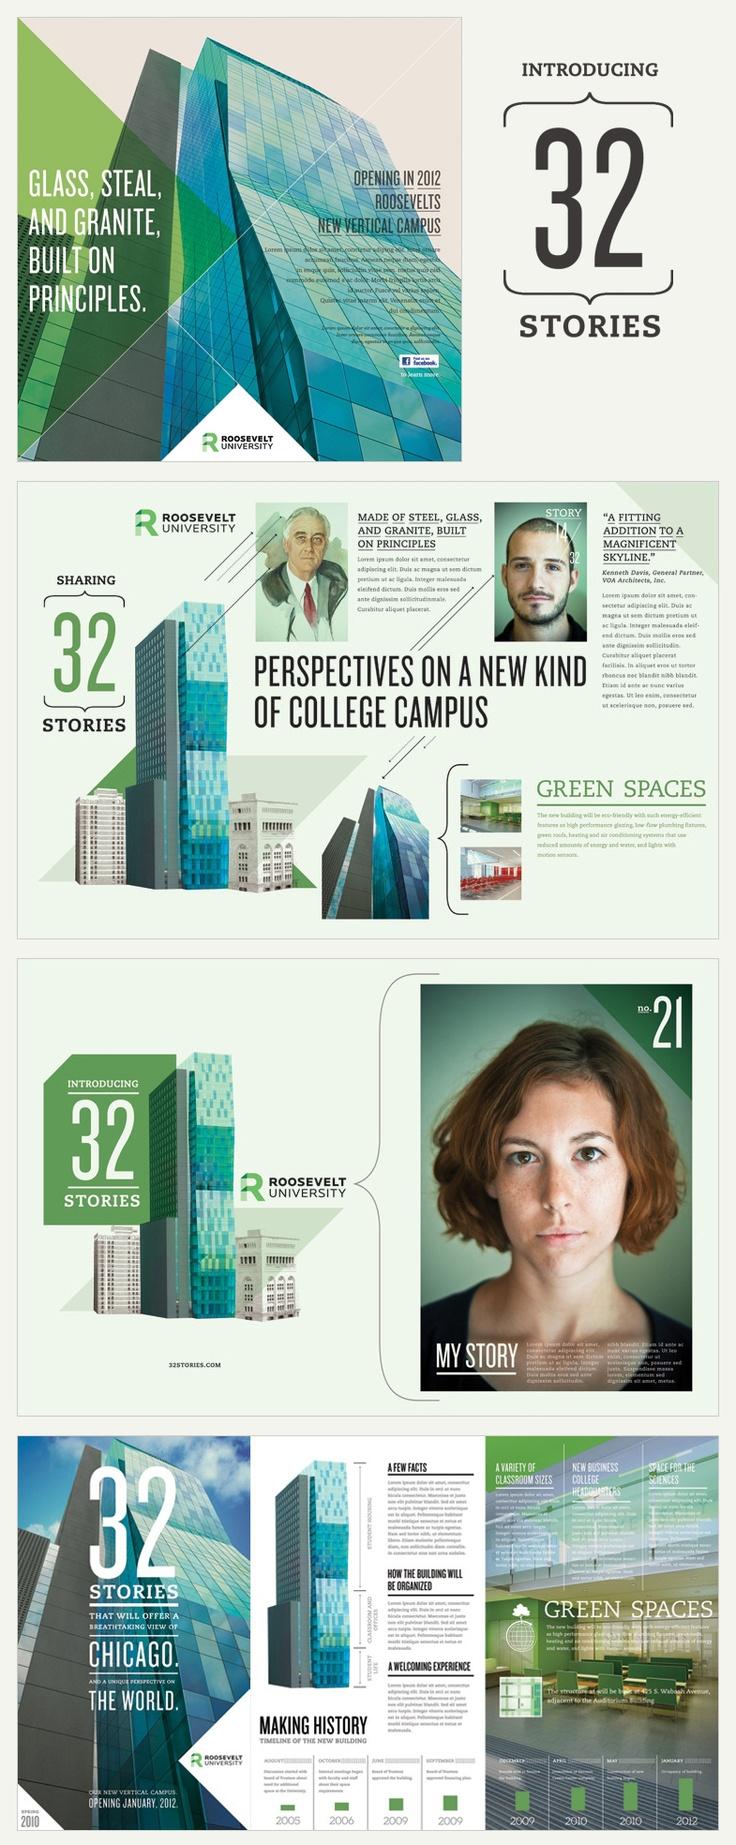 http://mikemcquade.com/Roosevelt-University